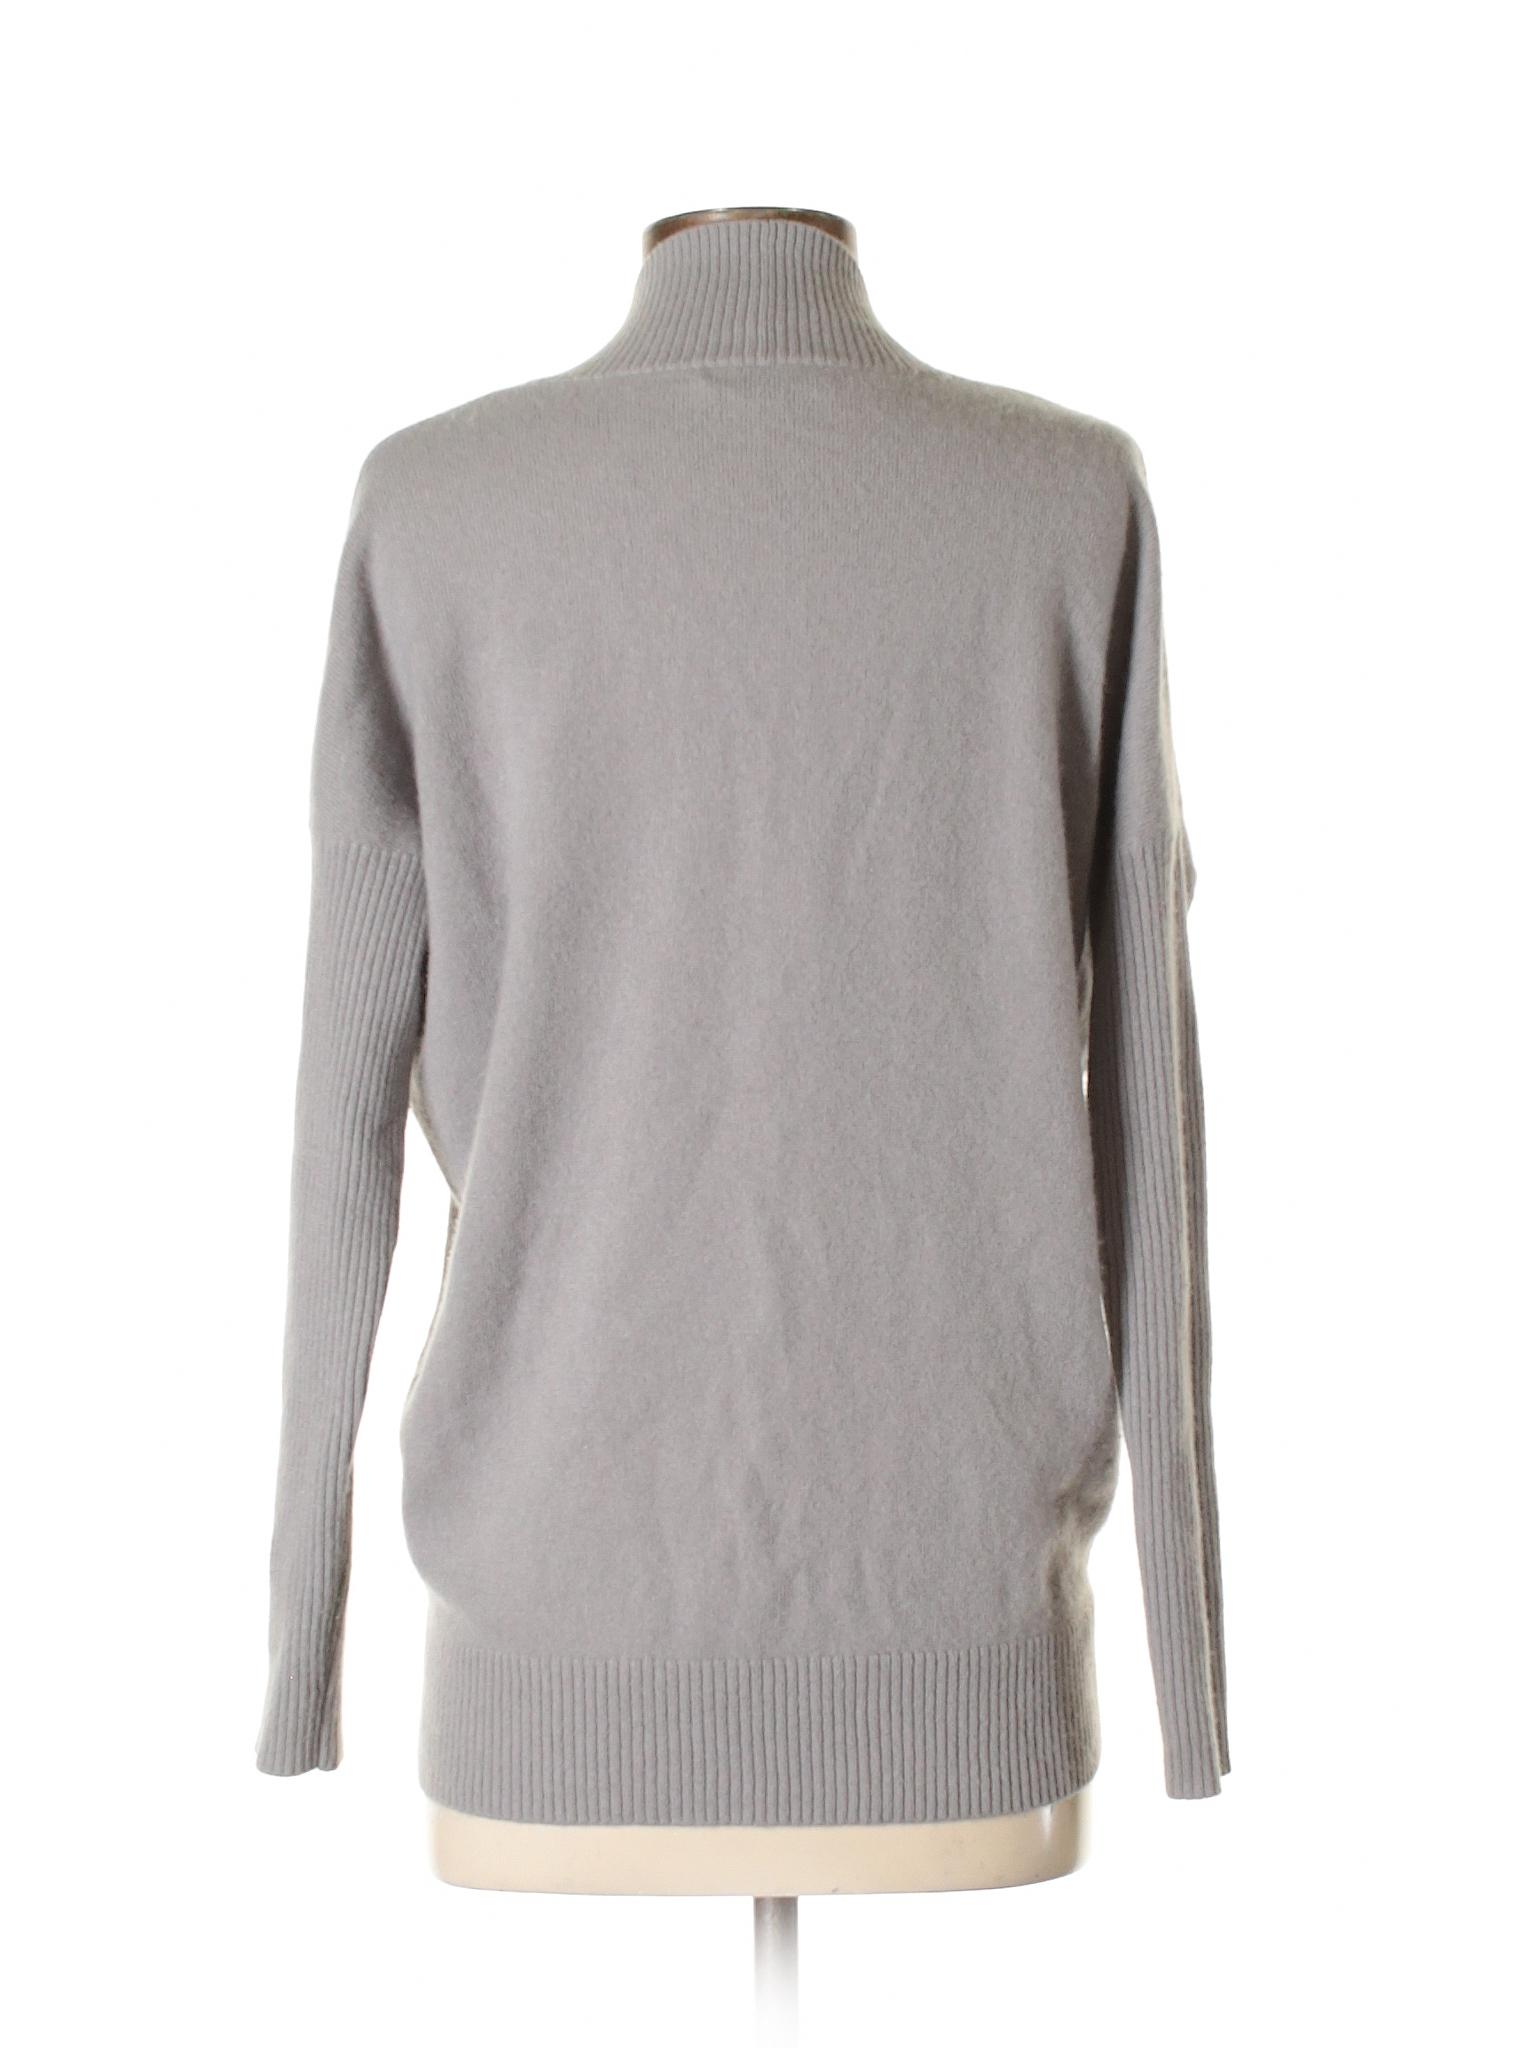 Ann Sweater Pullover Taylor Cashmere Boutique 4Pnqgw77